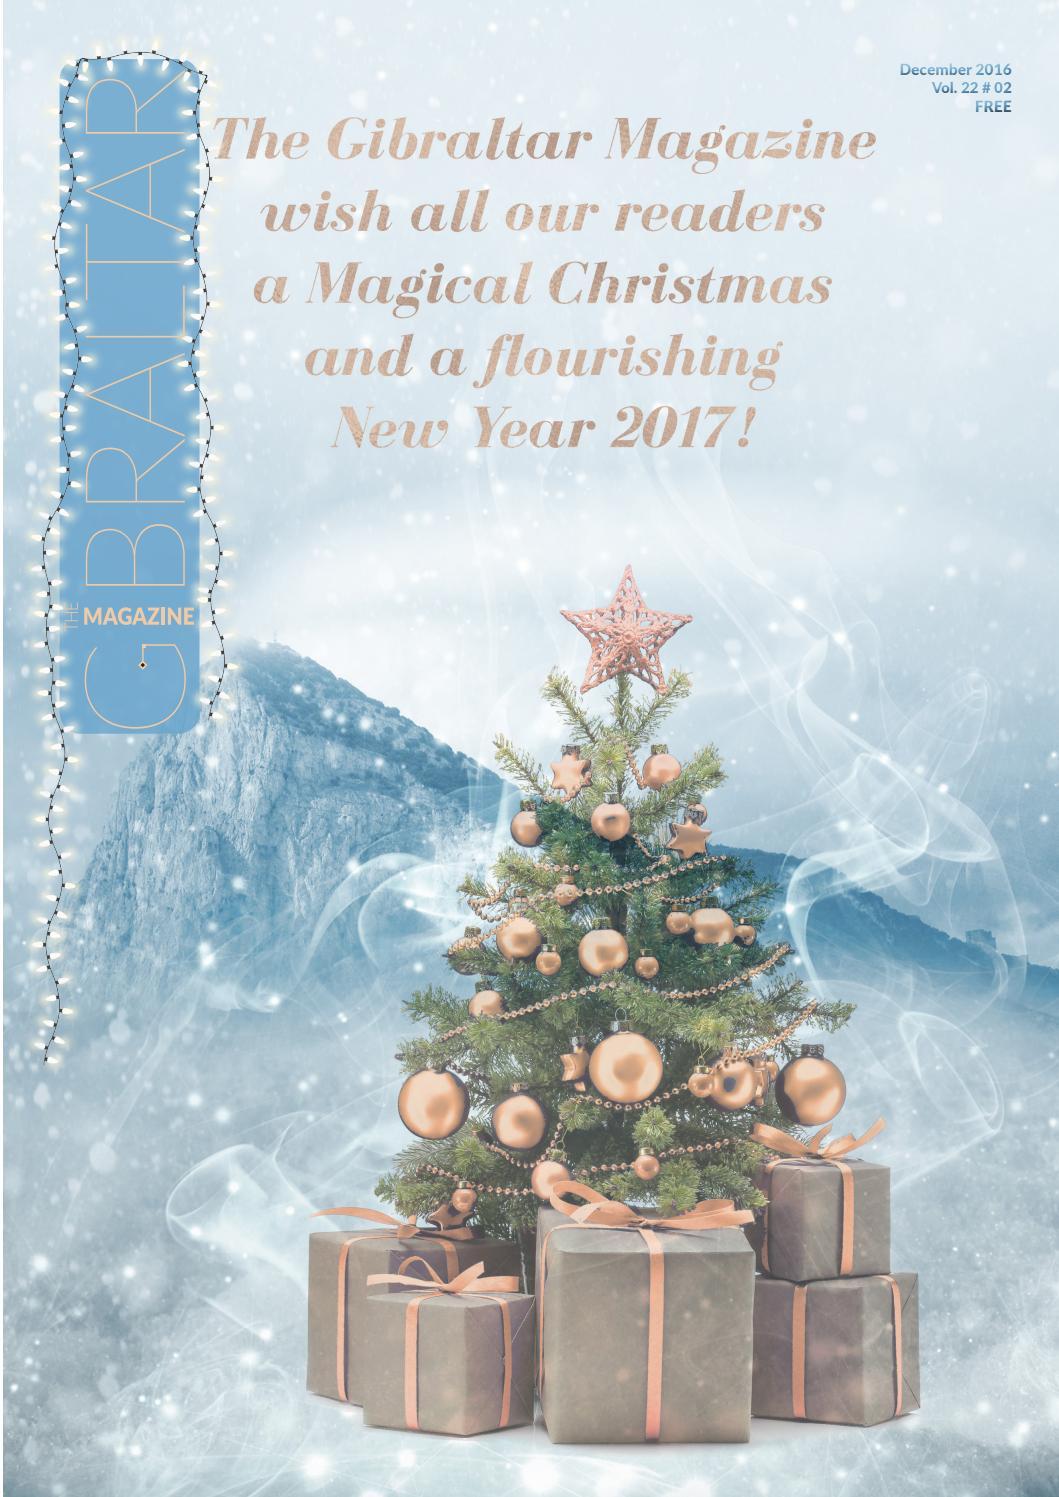 The Gibraltar Magazine - December 2016 by Rock Publishing Ltd - issuu